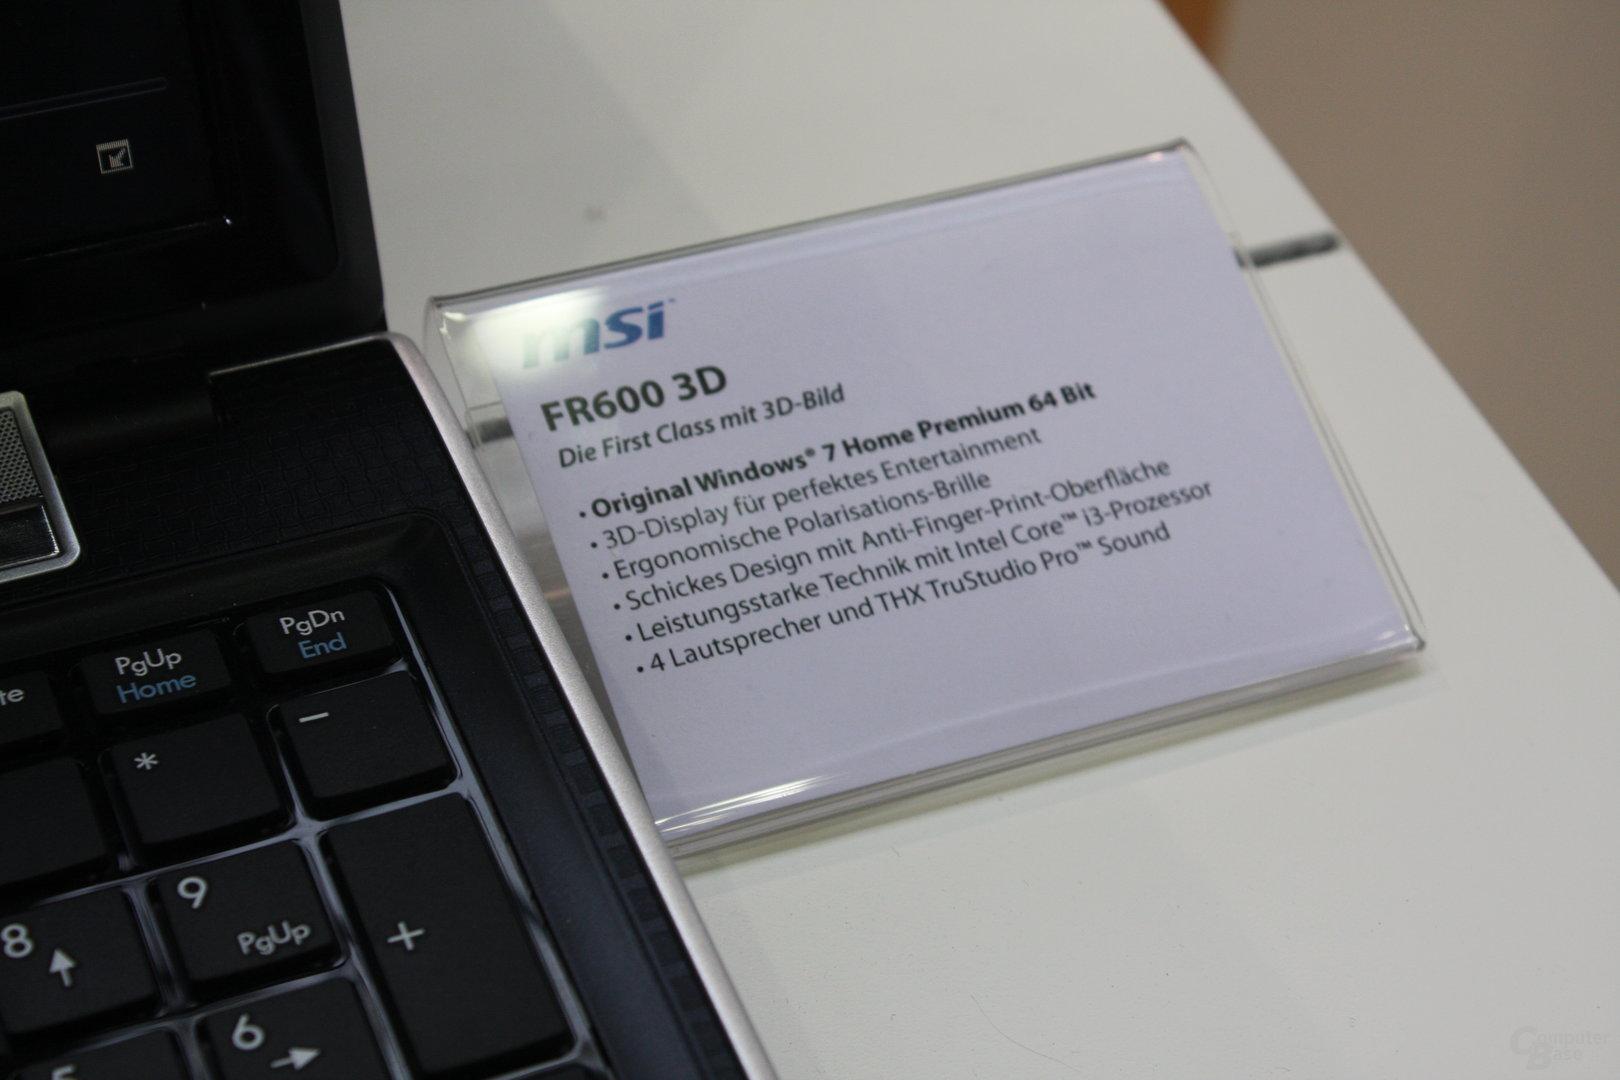 MSI FR600 3D